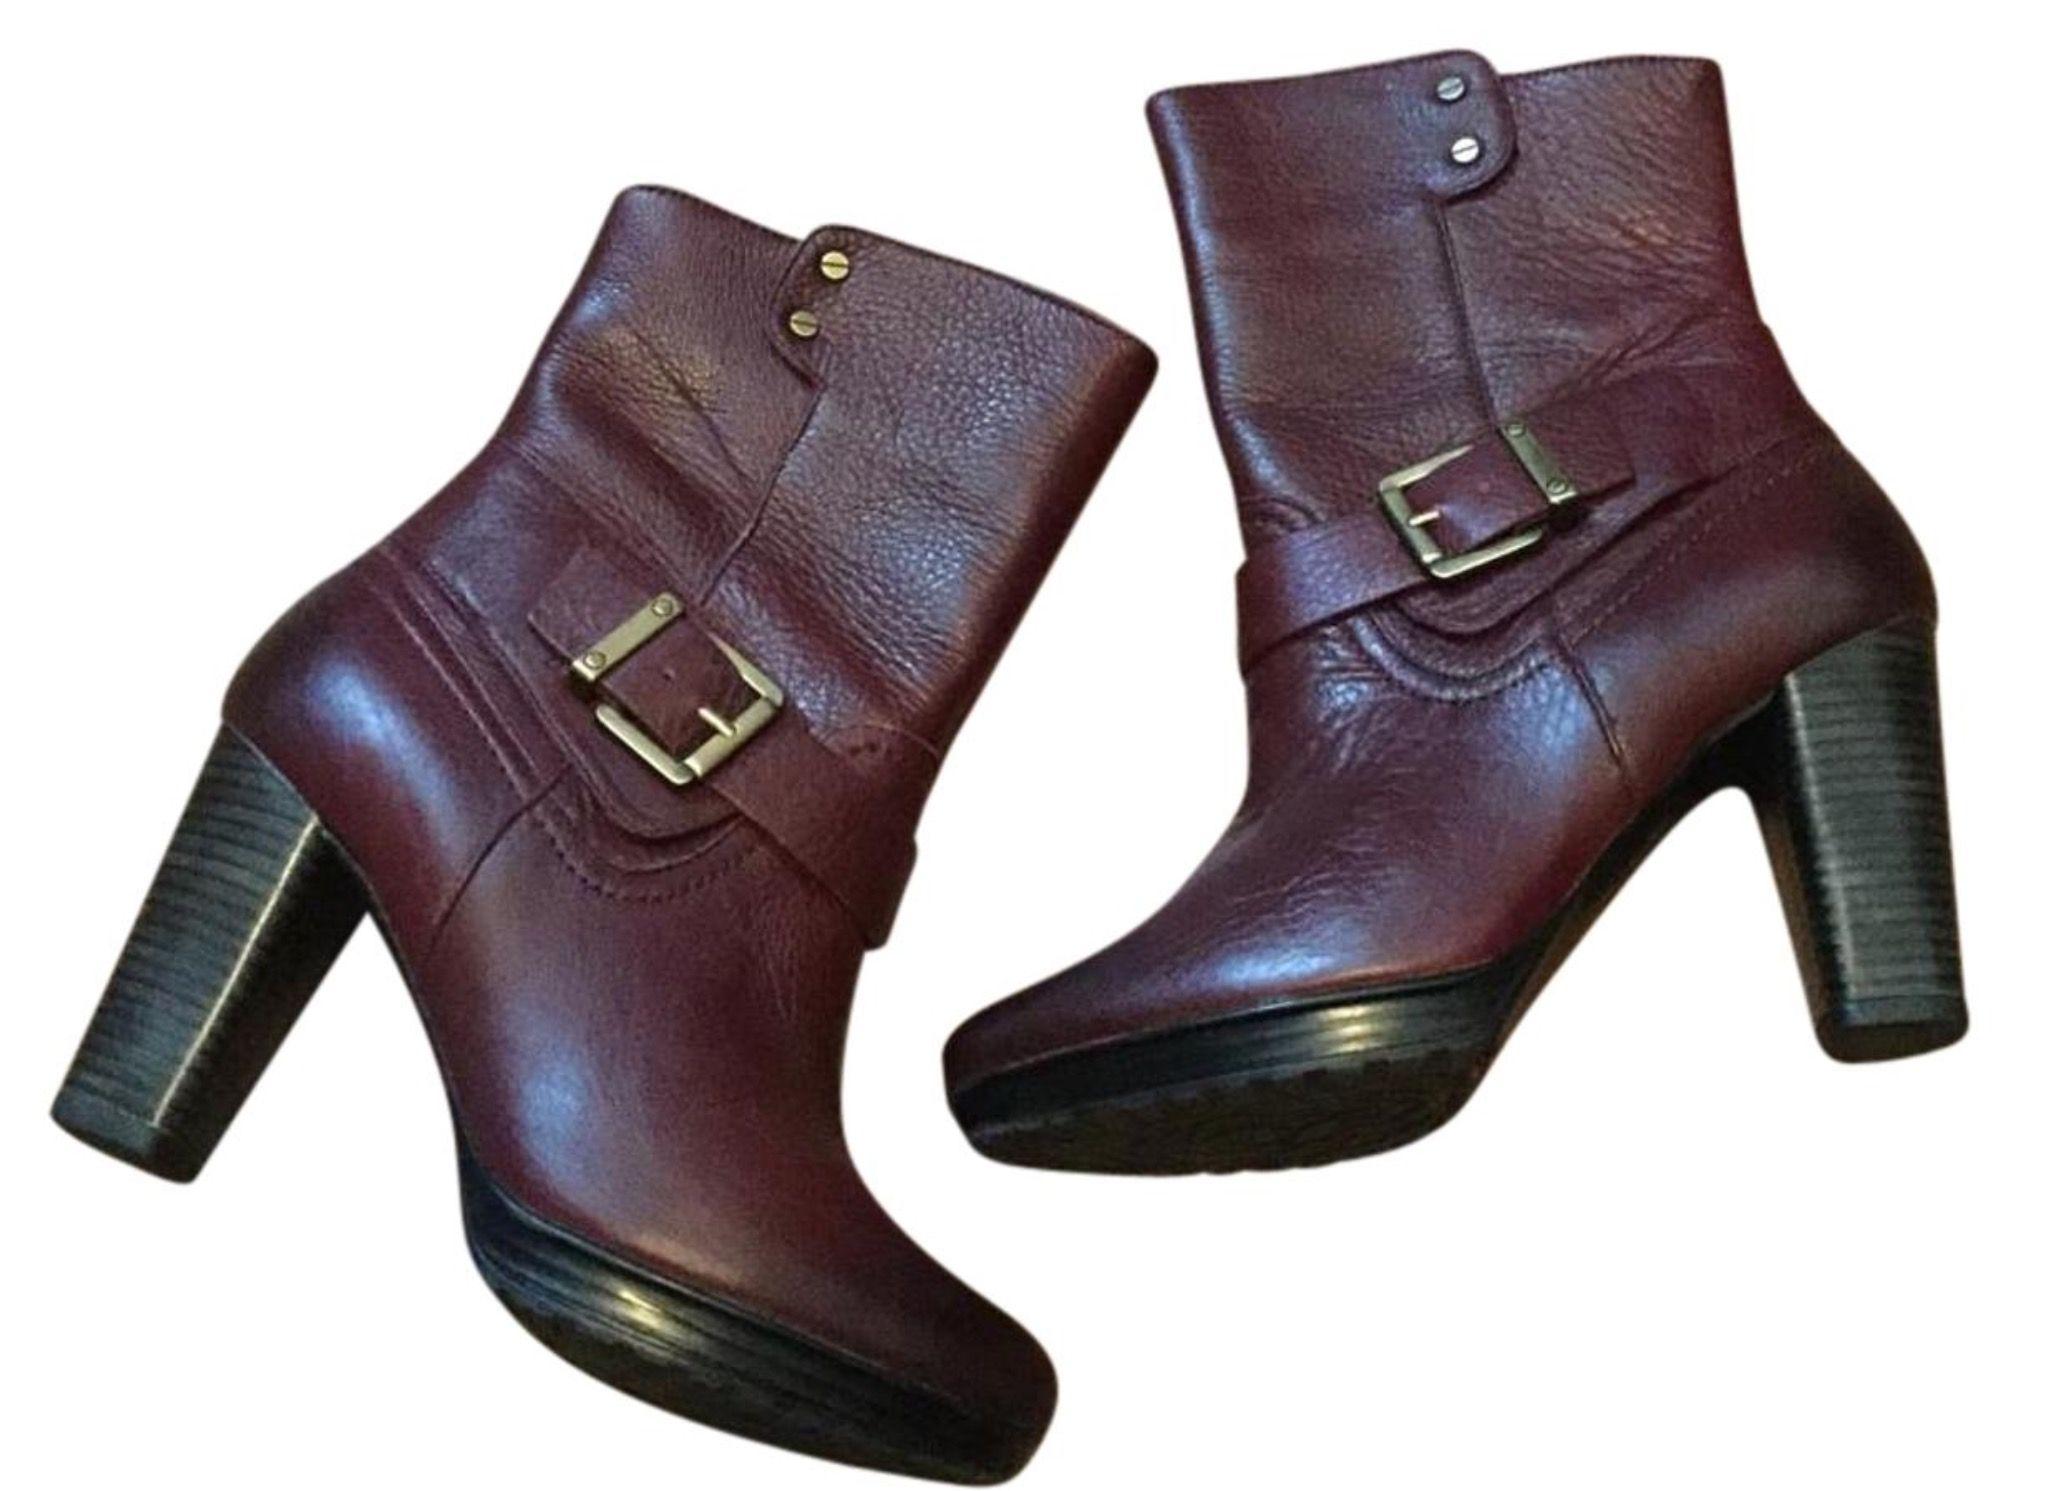 Oxblood pebbled leather ankle boots. #buyit :  www.Tradesy.com/closet/bargainsandbaubles Clarks Lida Sayer, size 7.